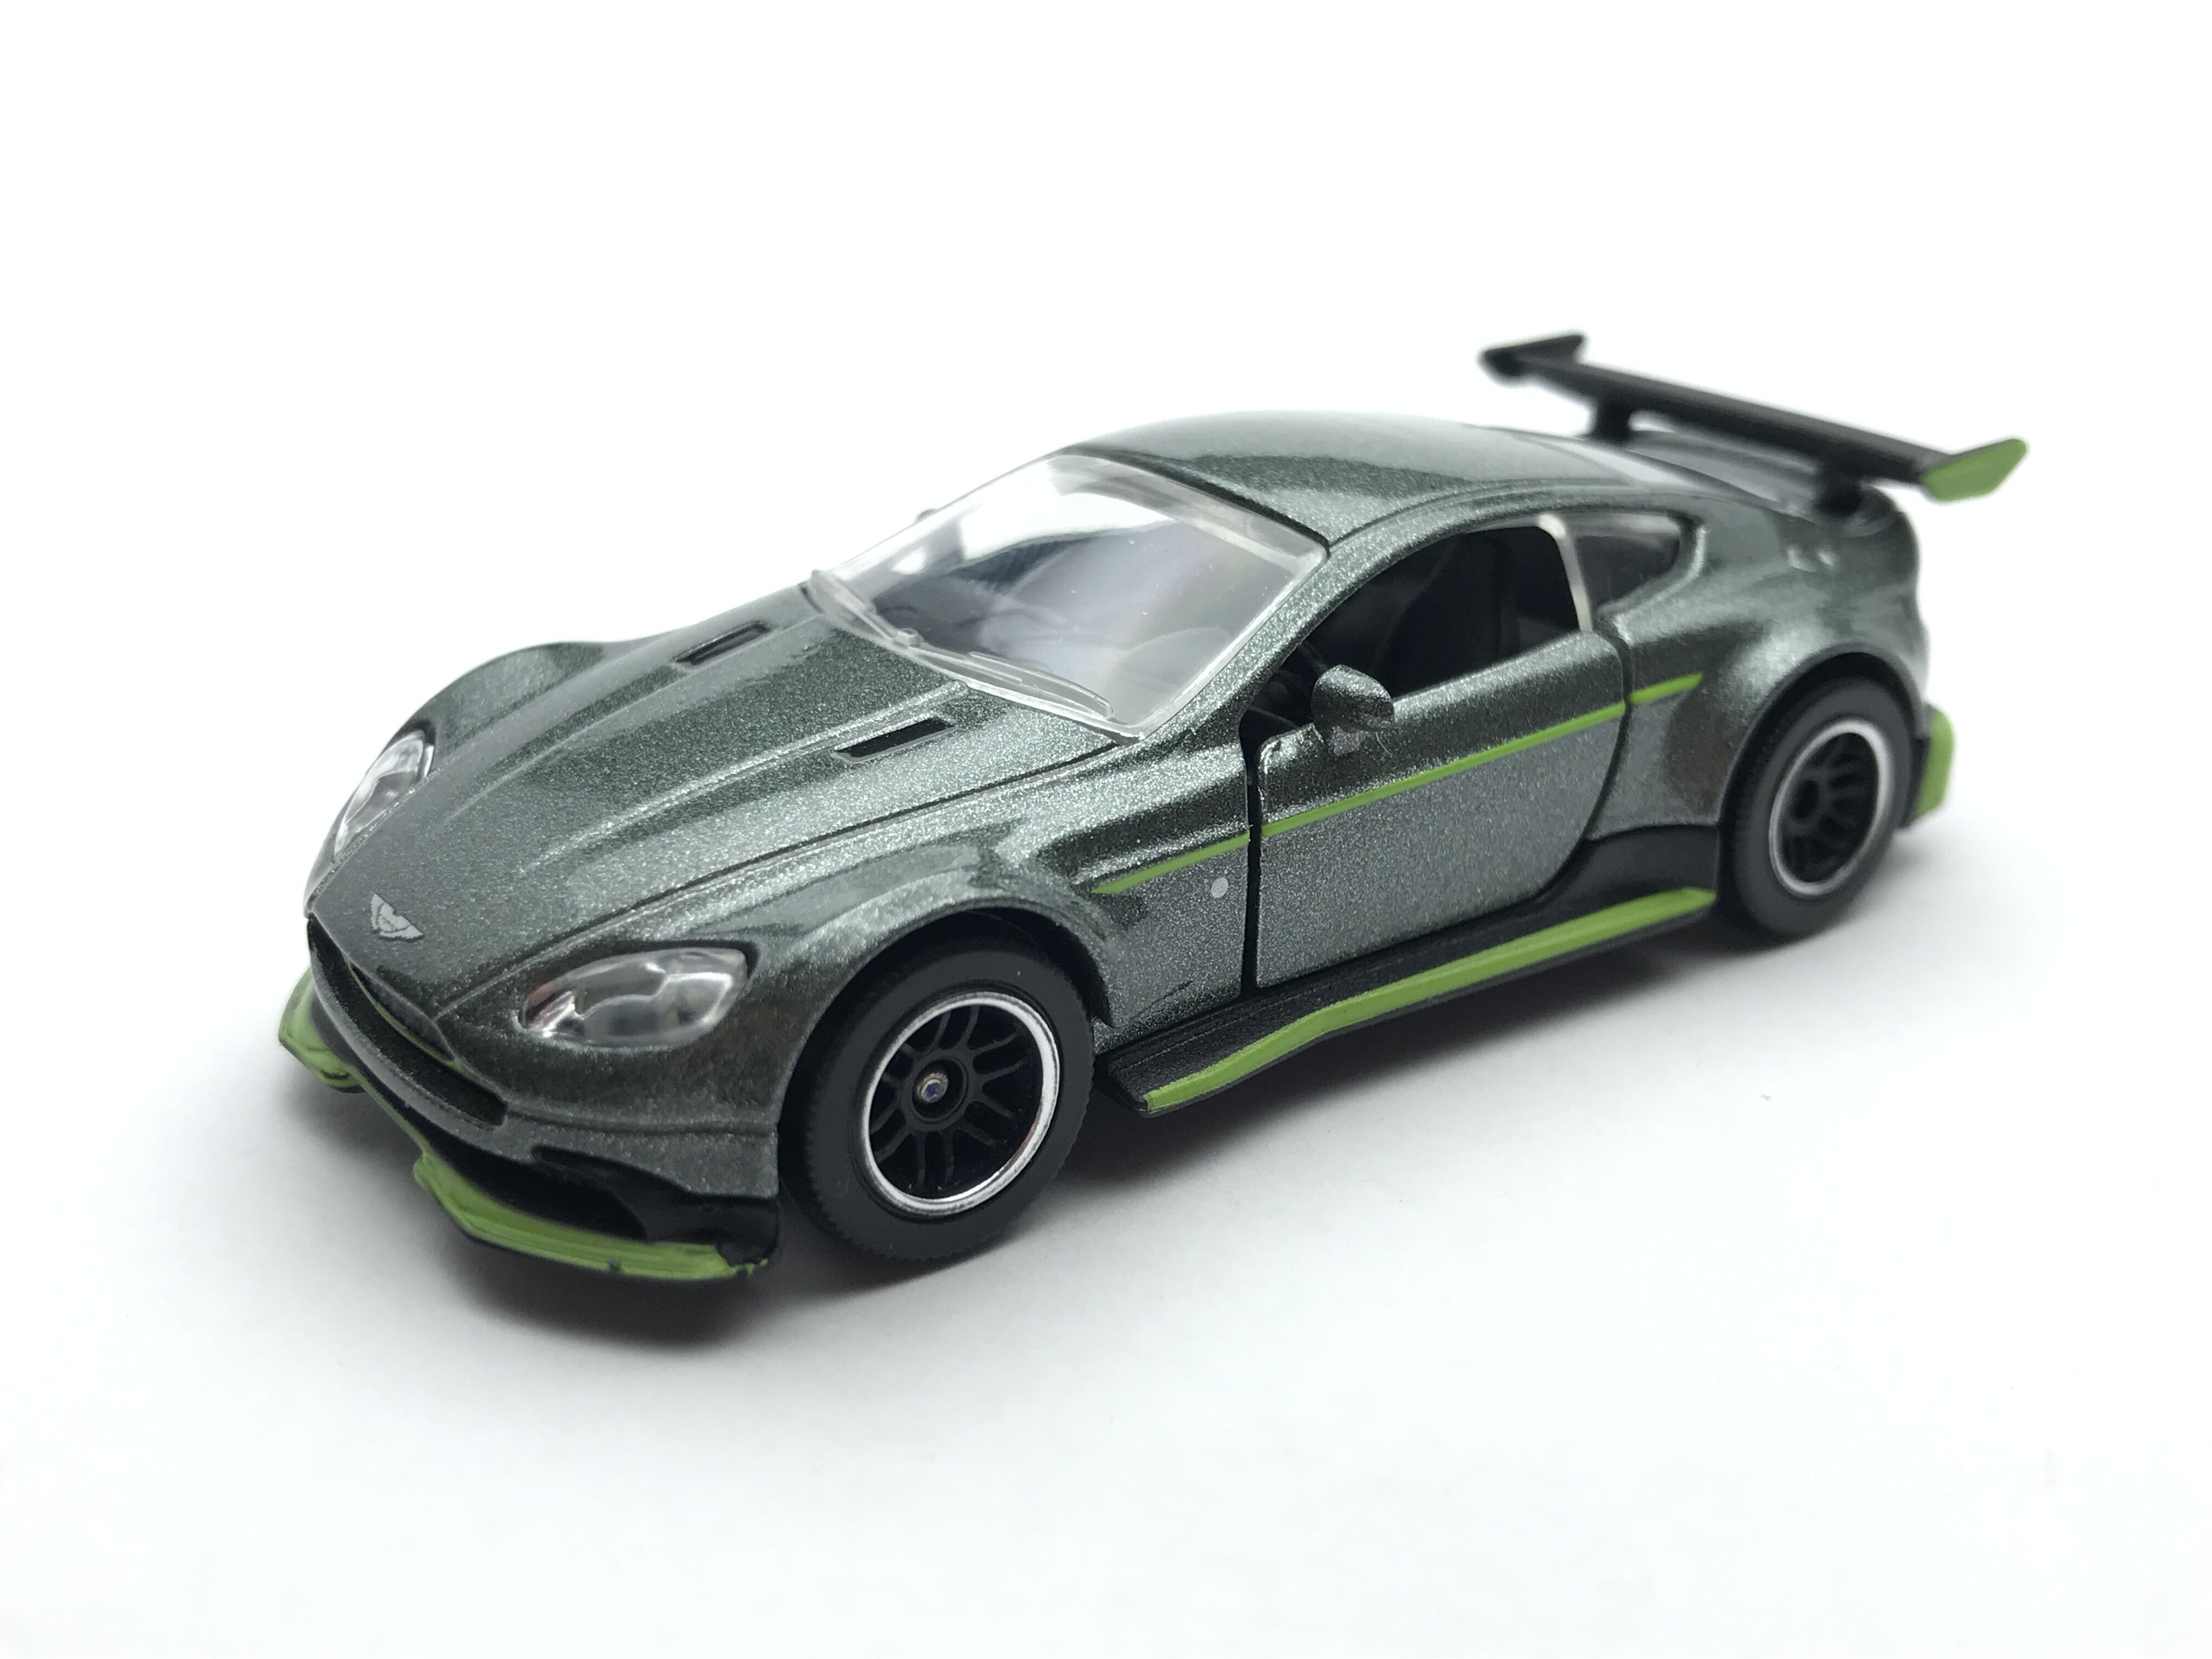 Aston Martin Vantage Gt8 Majorette Model Cars Wiki Fandom